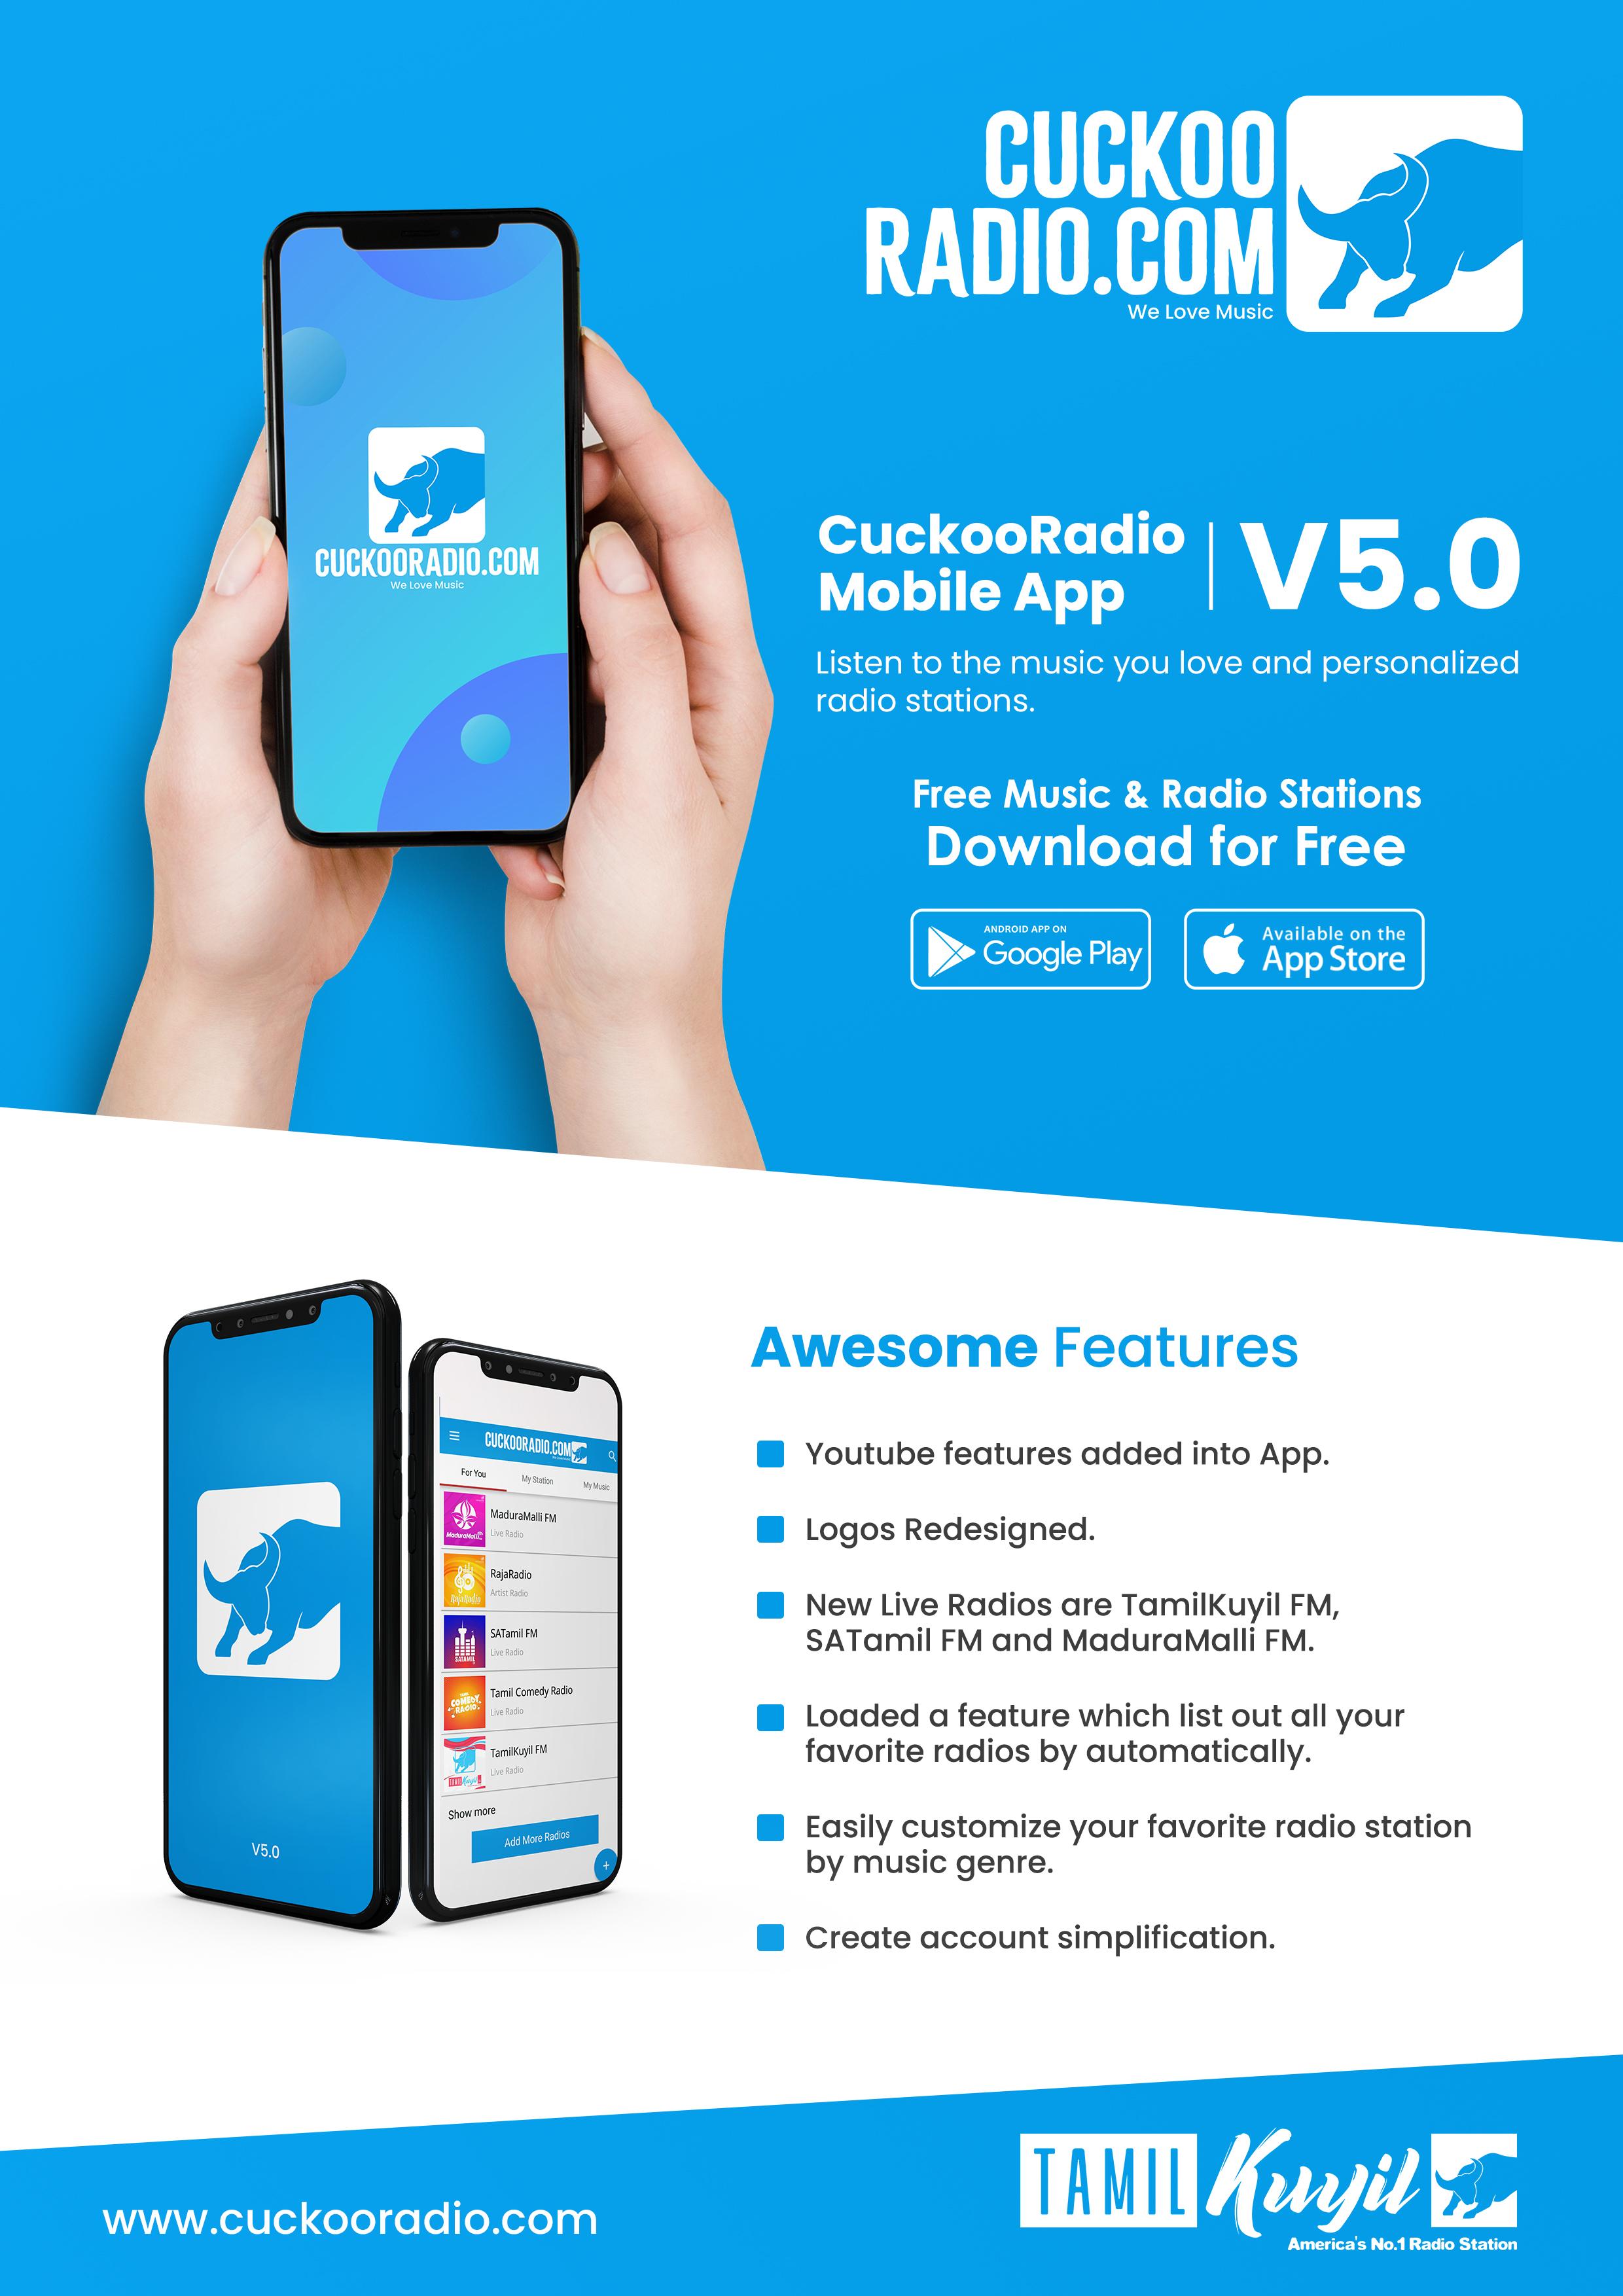 Cuckoo Radio New App